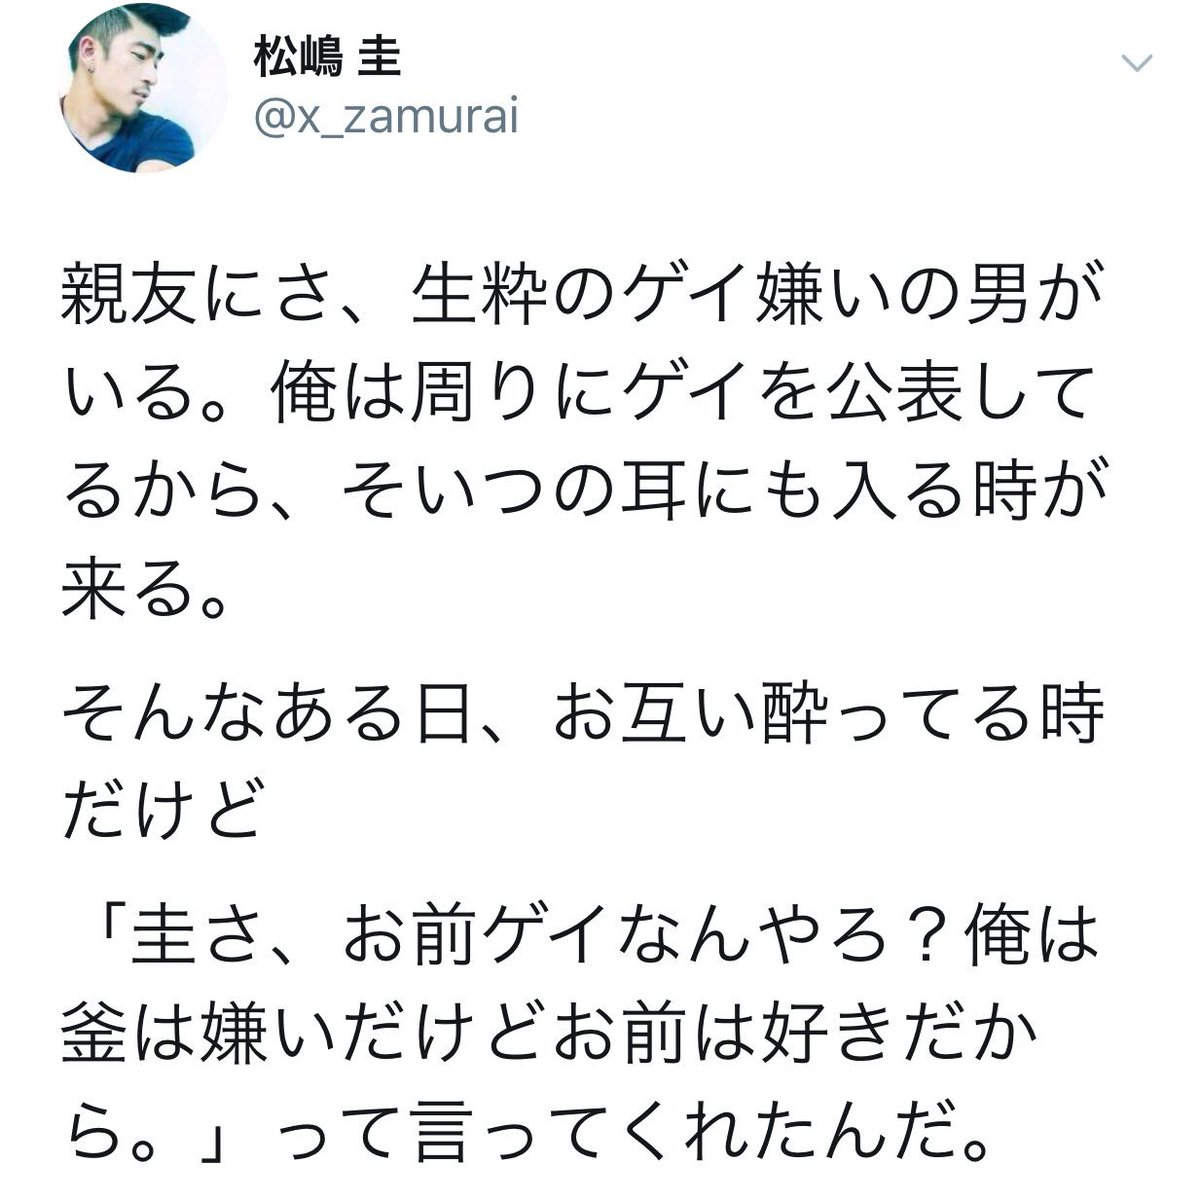 appear in ゲイ 日本